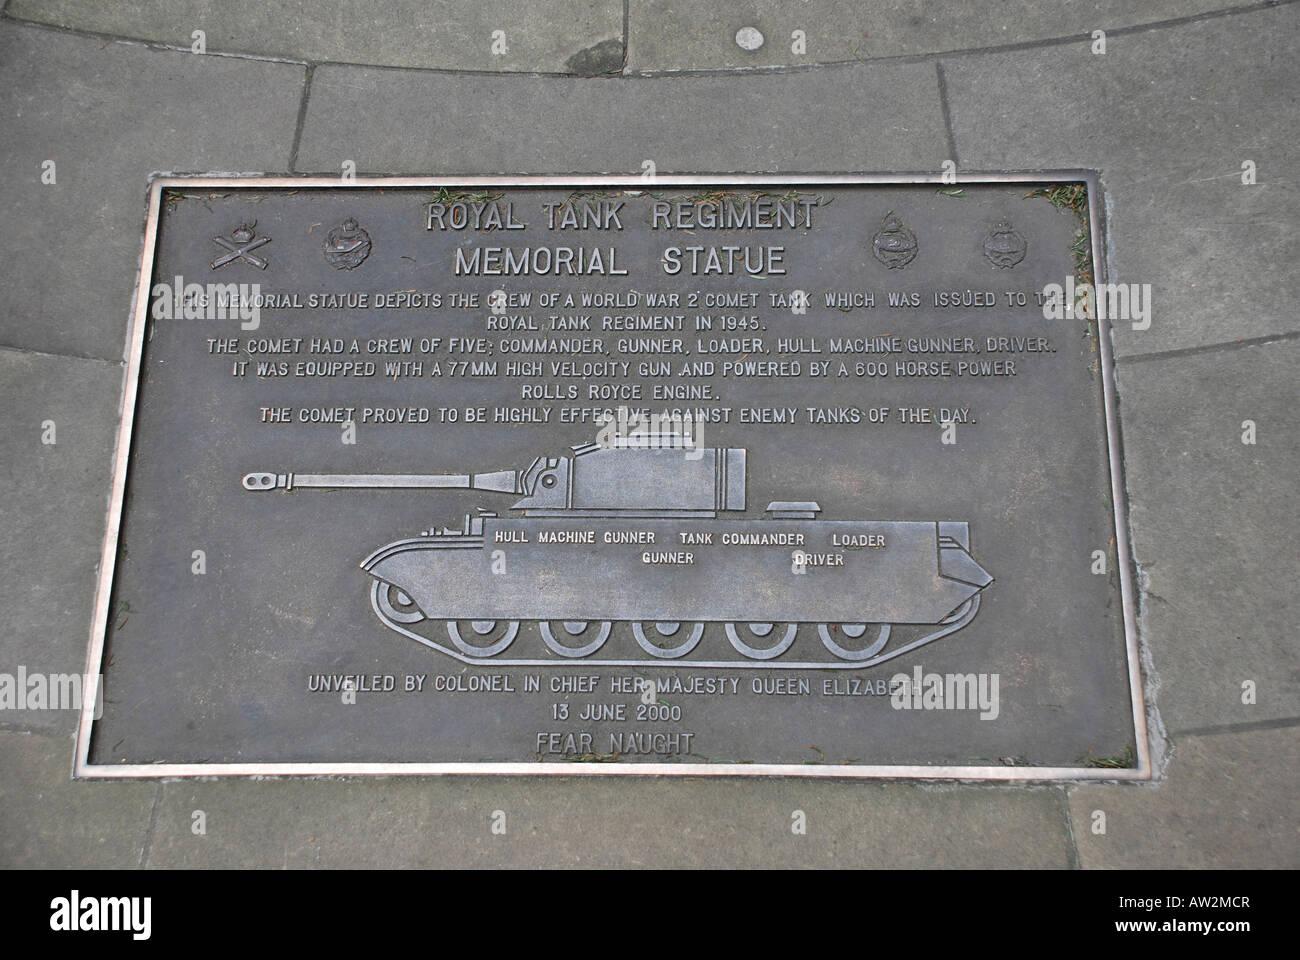 Royal Tank Regiment memorial statue plaque, London Stock Photo